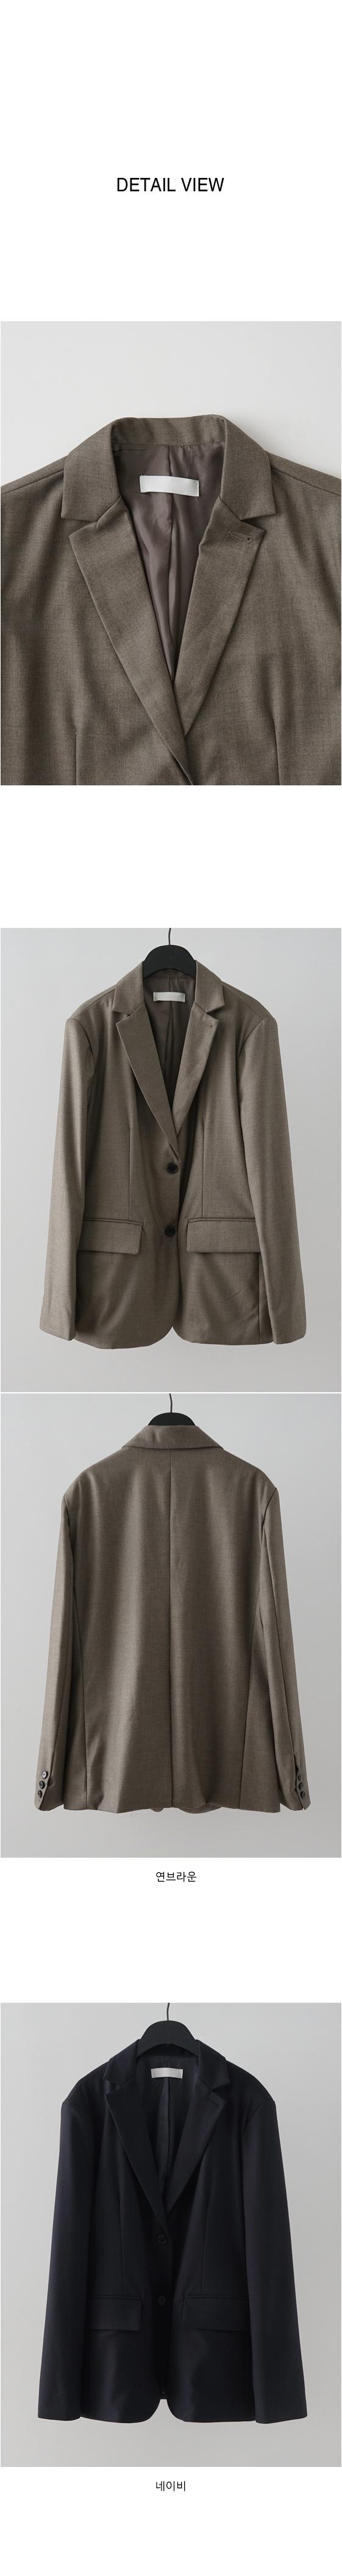 chic mood formal jacket